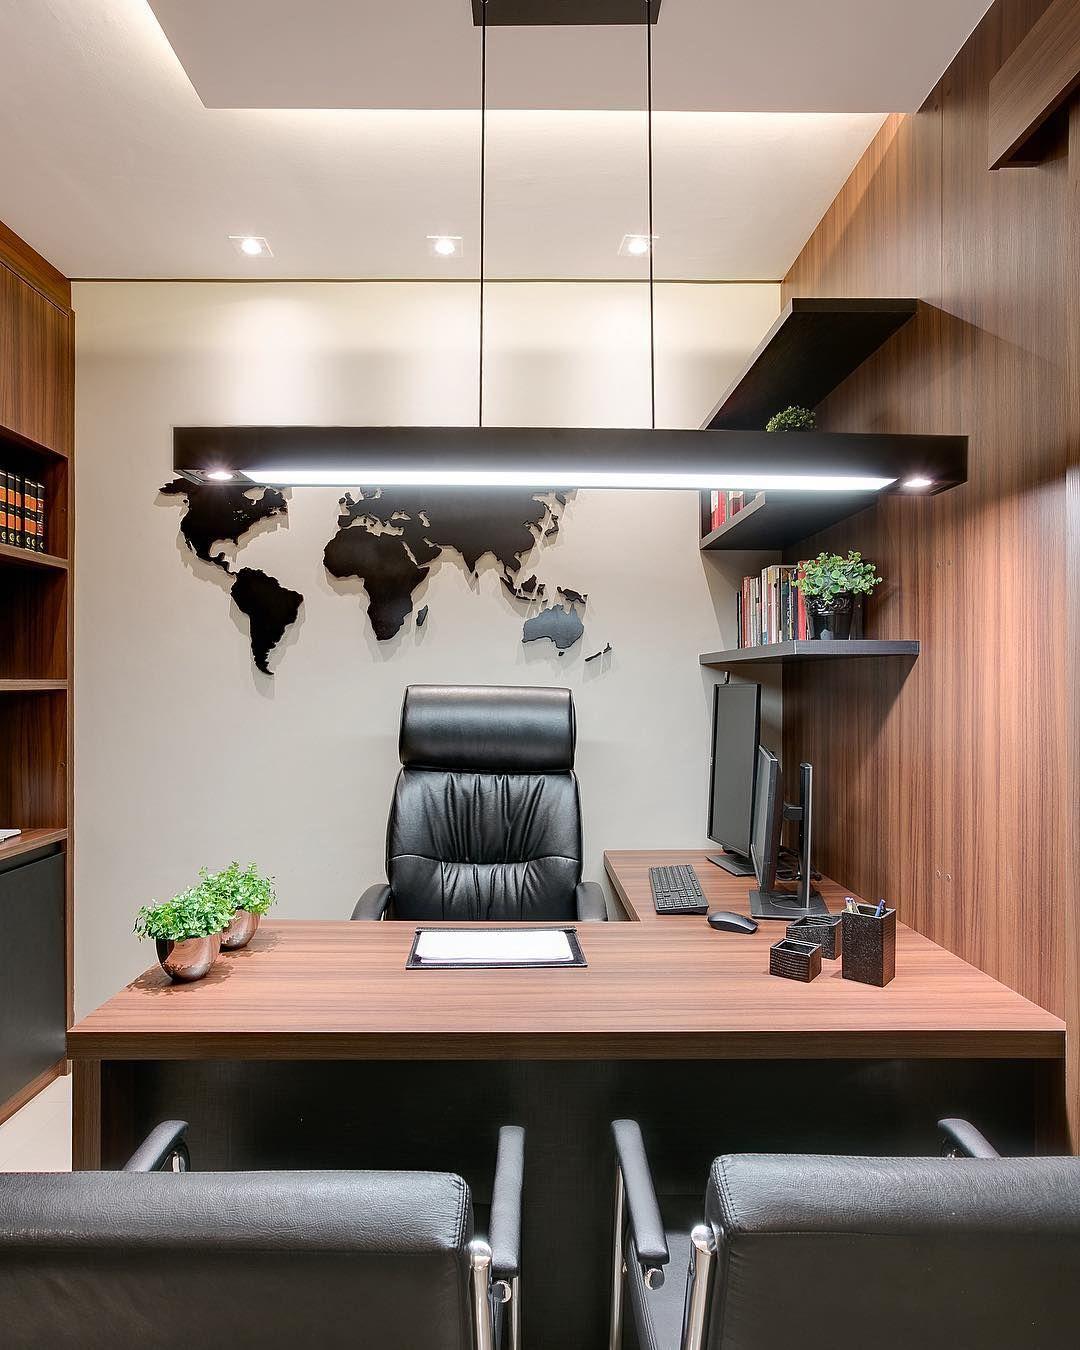 Pin De JPavan Em Escritório/Home Office